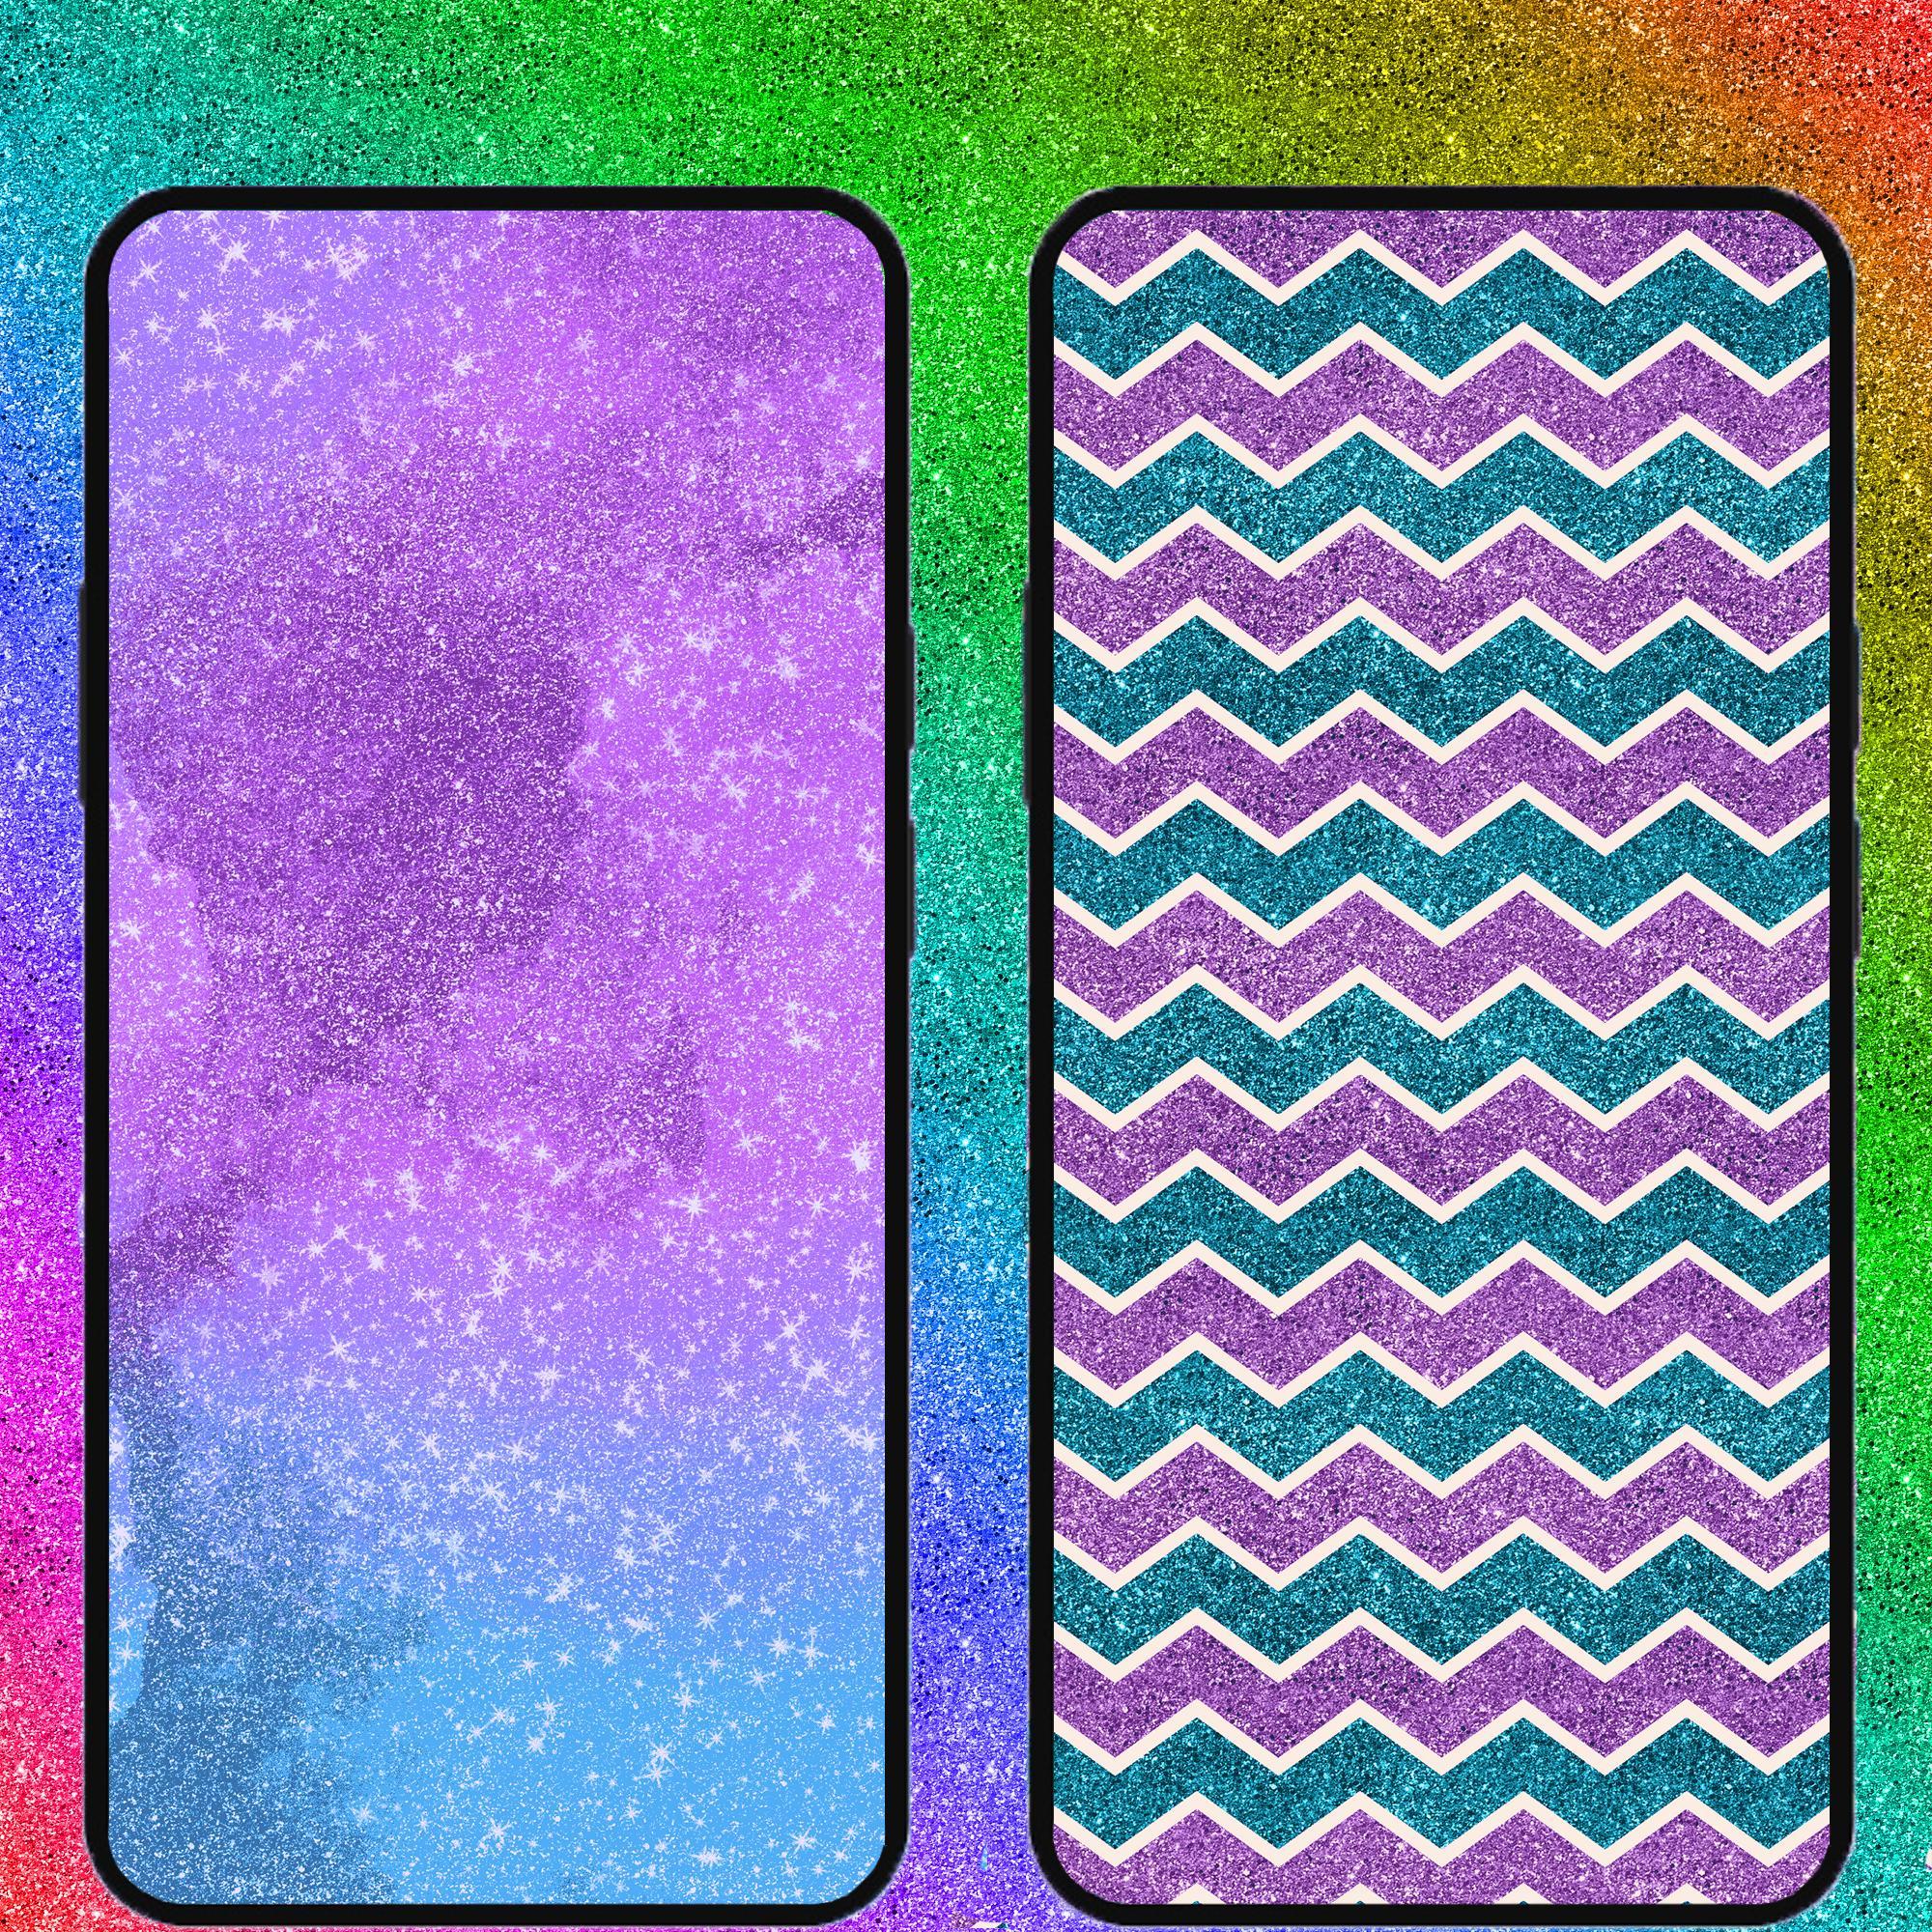 Android 用の キラキラ壁紙 Glitter Wallpapers Apk をダウンロード